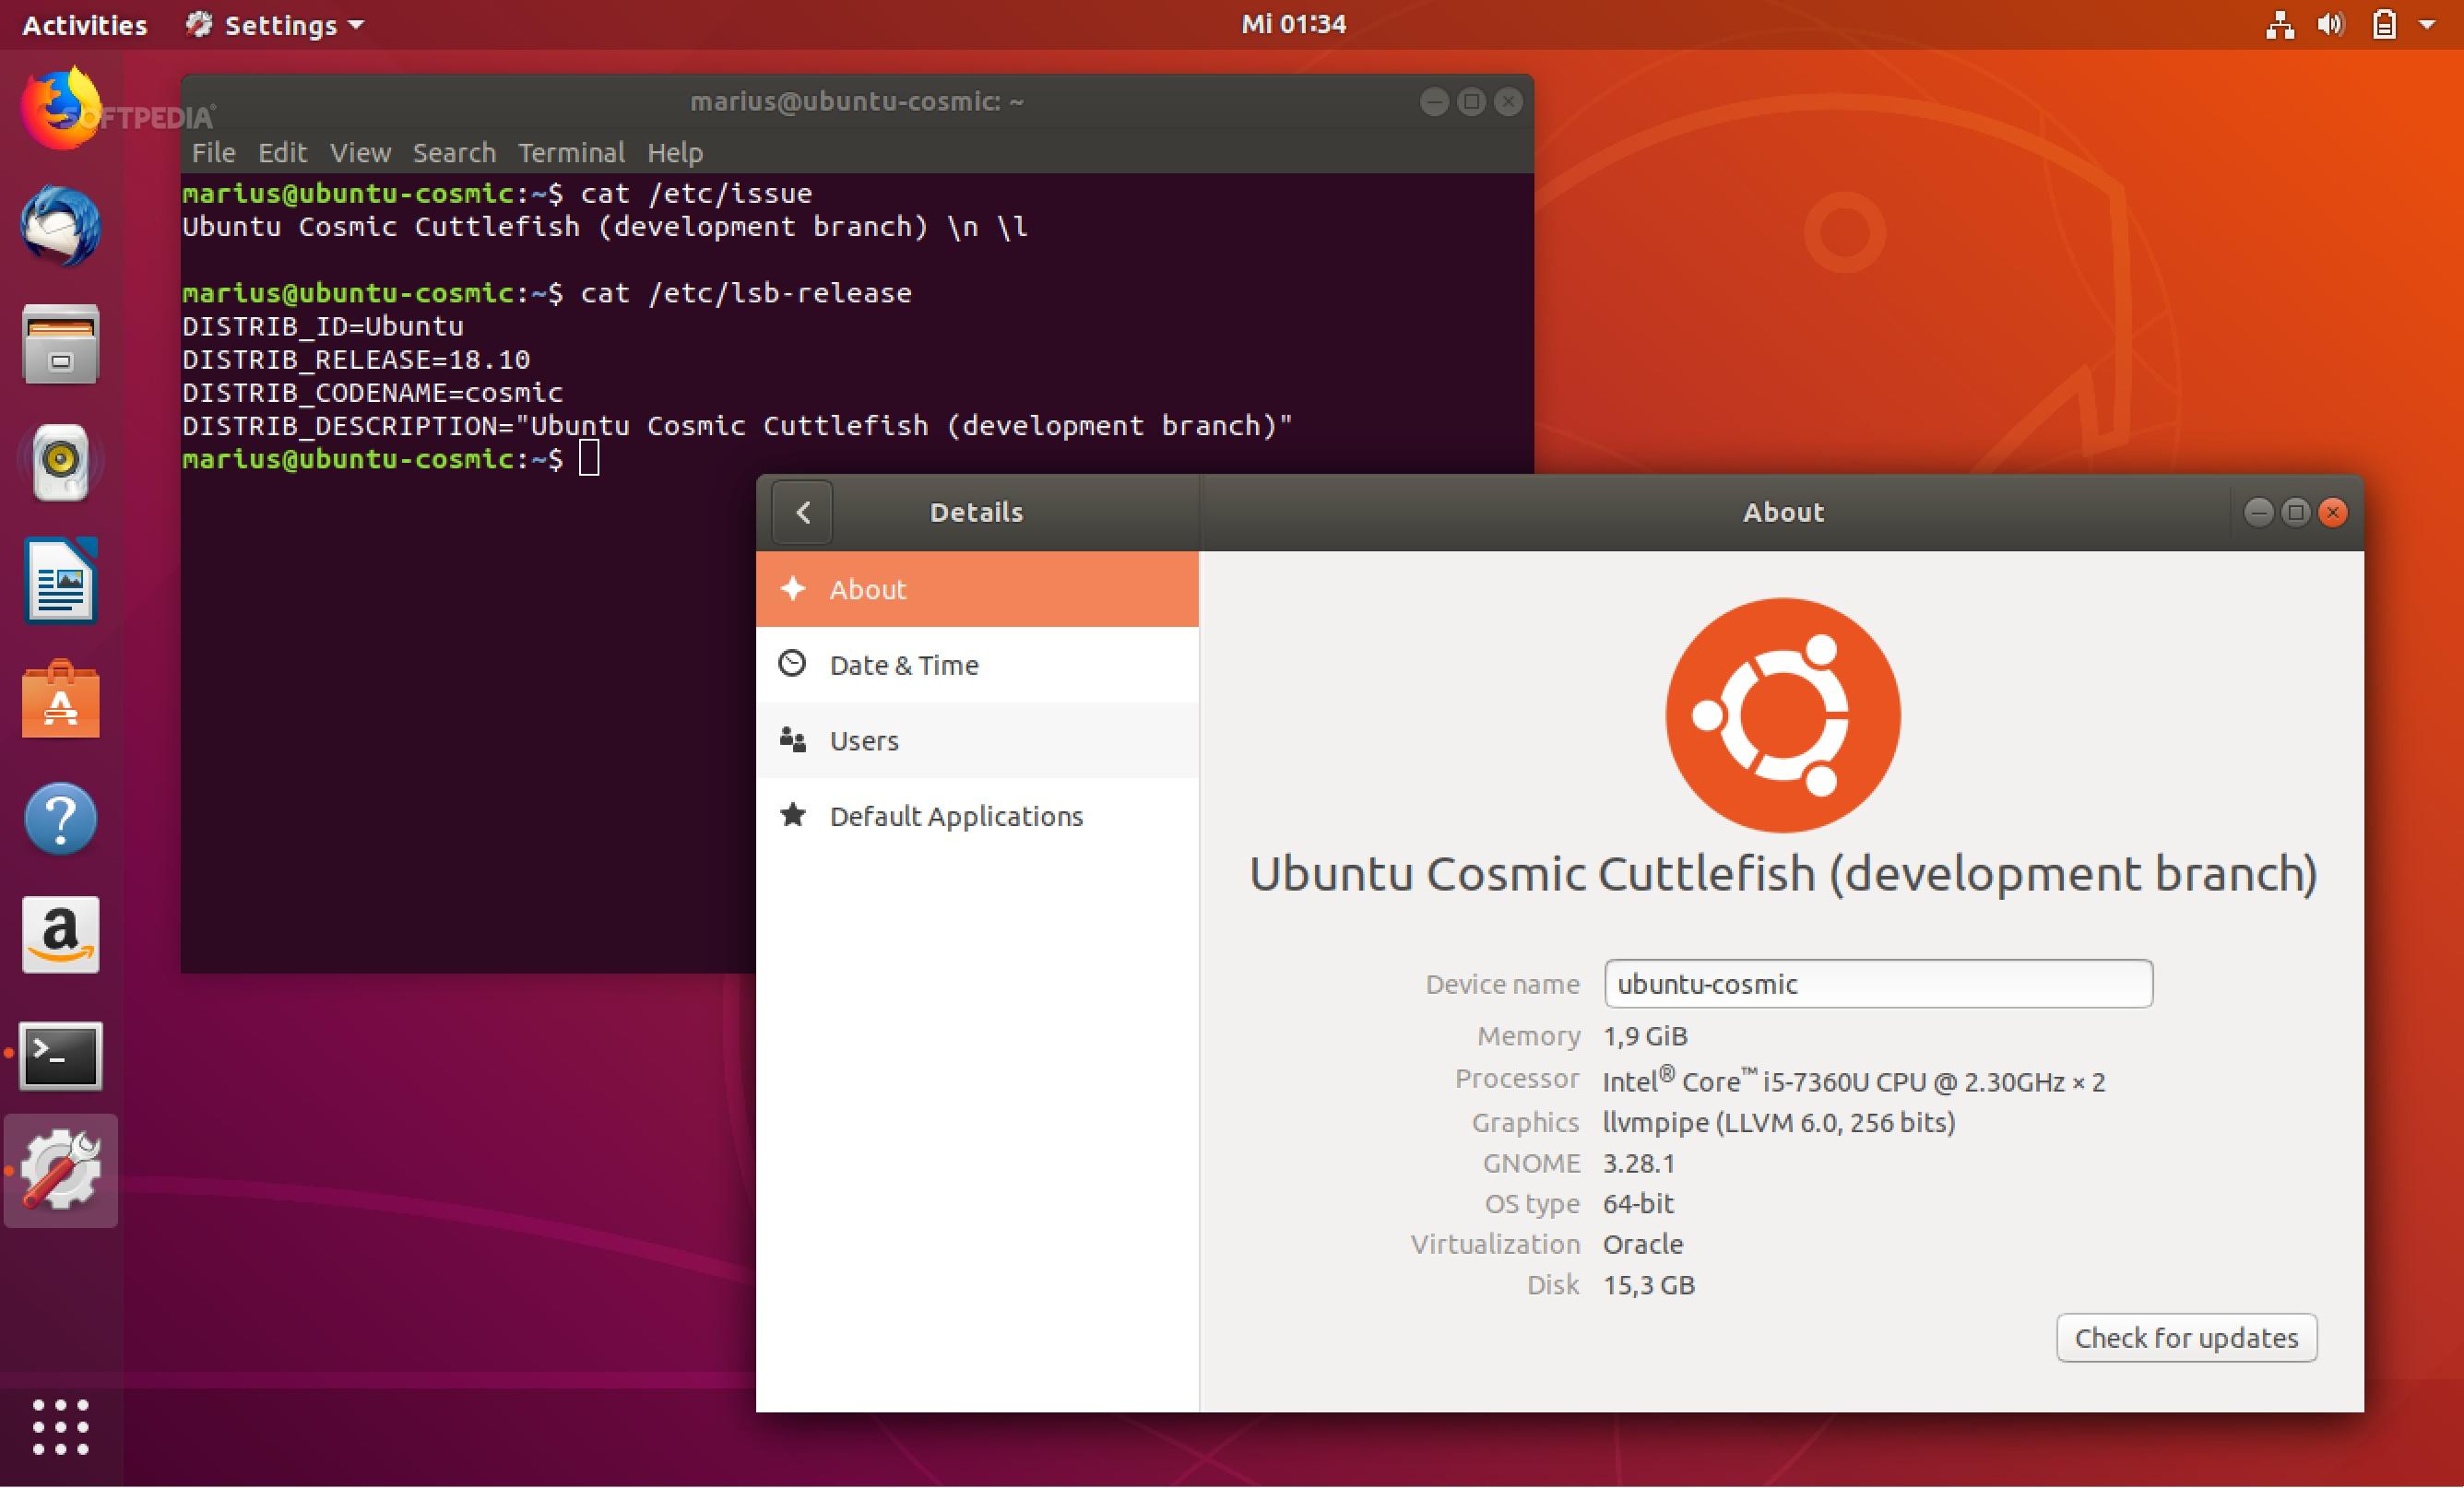 ubuntu-18-10-cosmic-cuttlefish-is-now-officially-open-for-development-521044-2.jpg